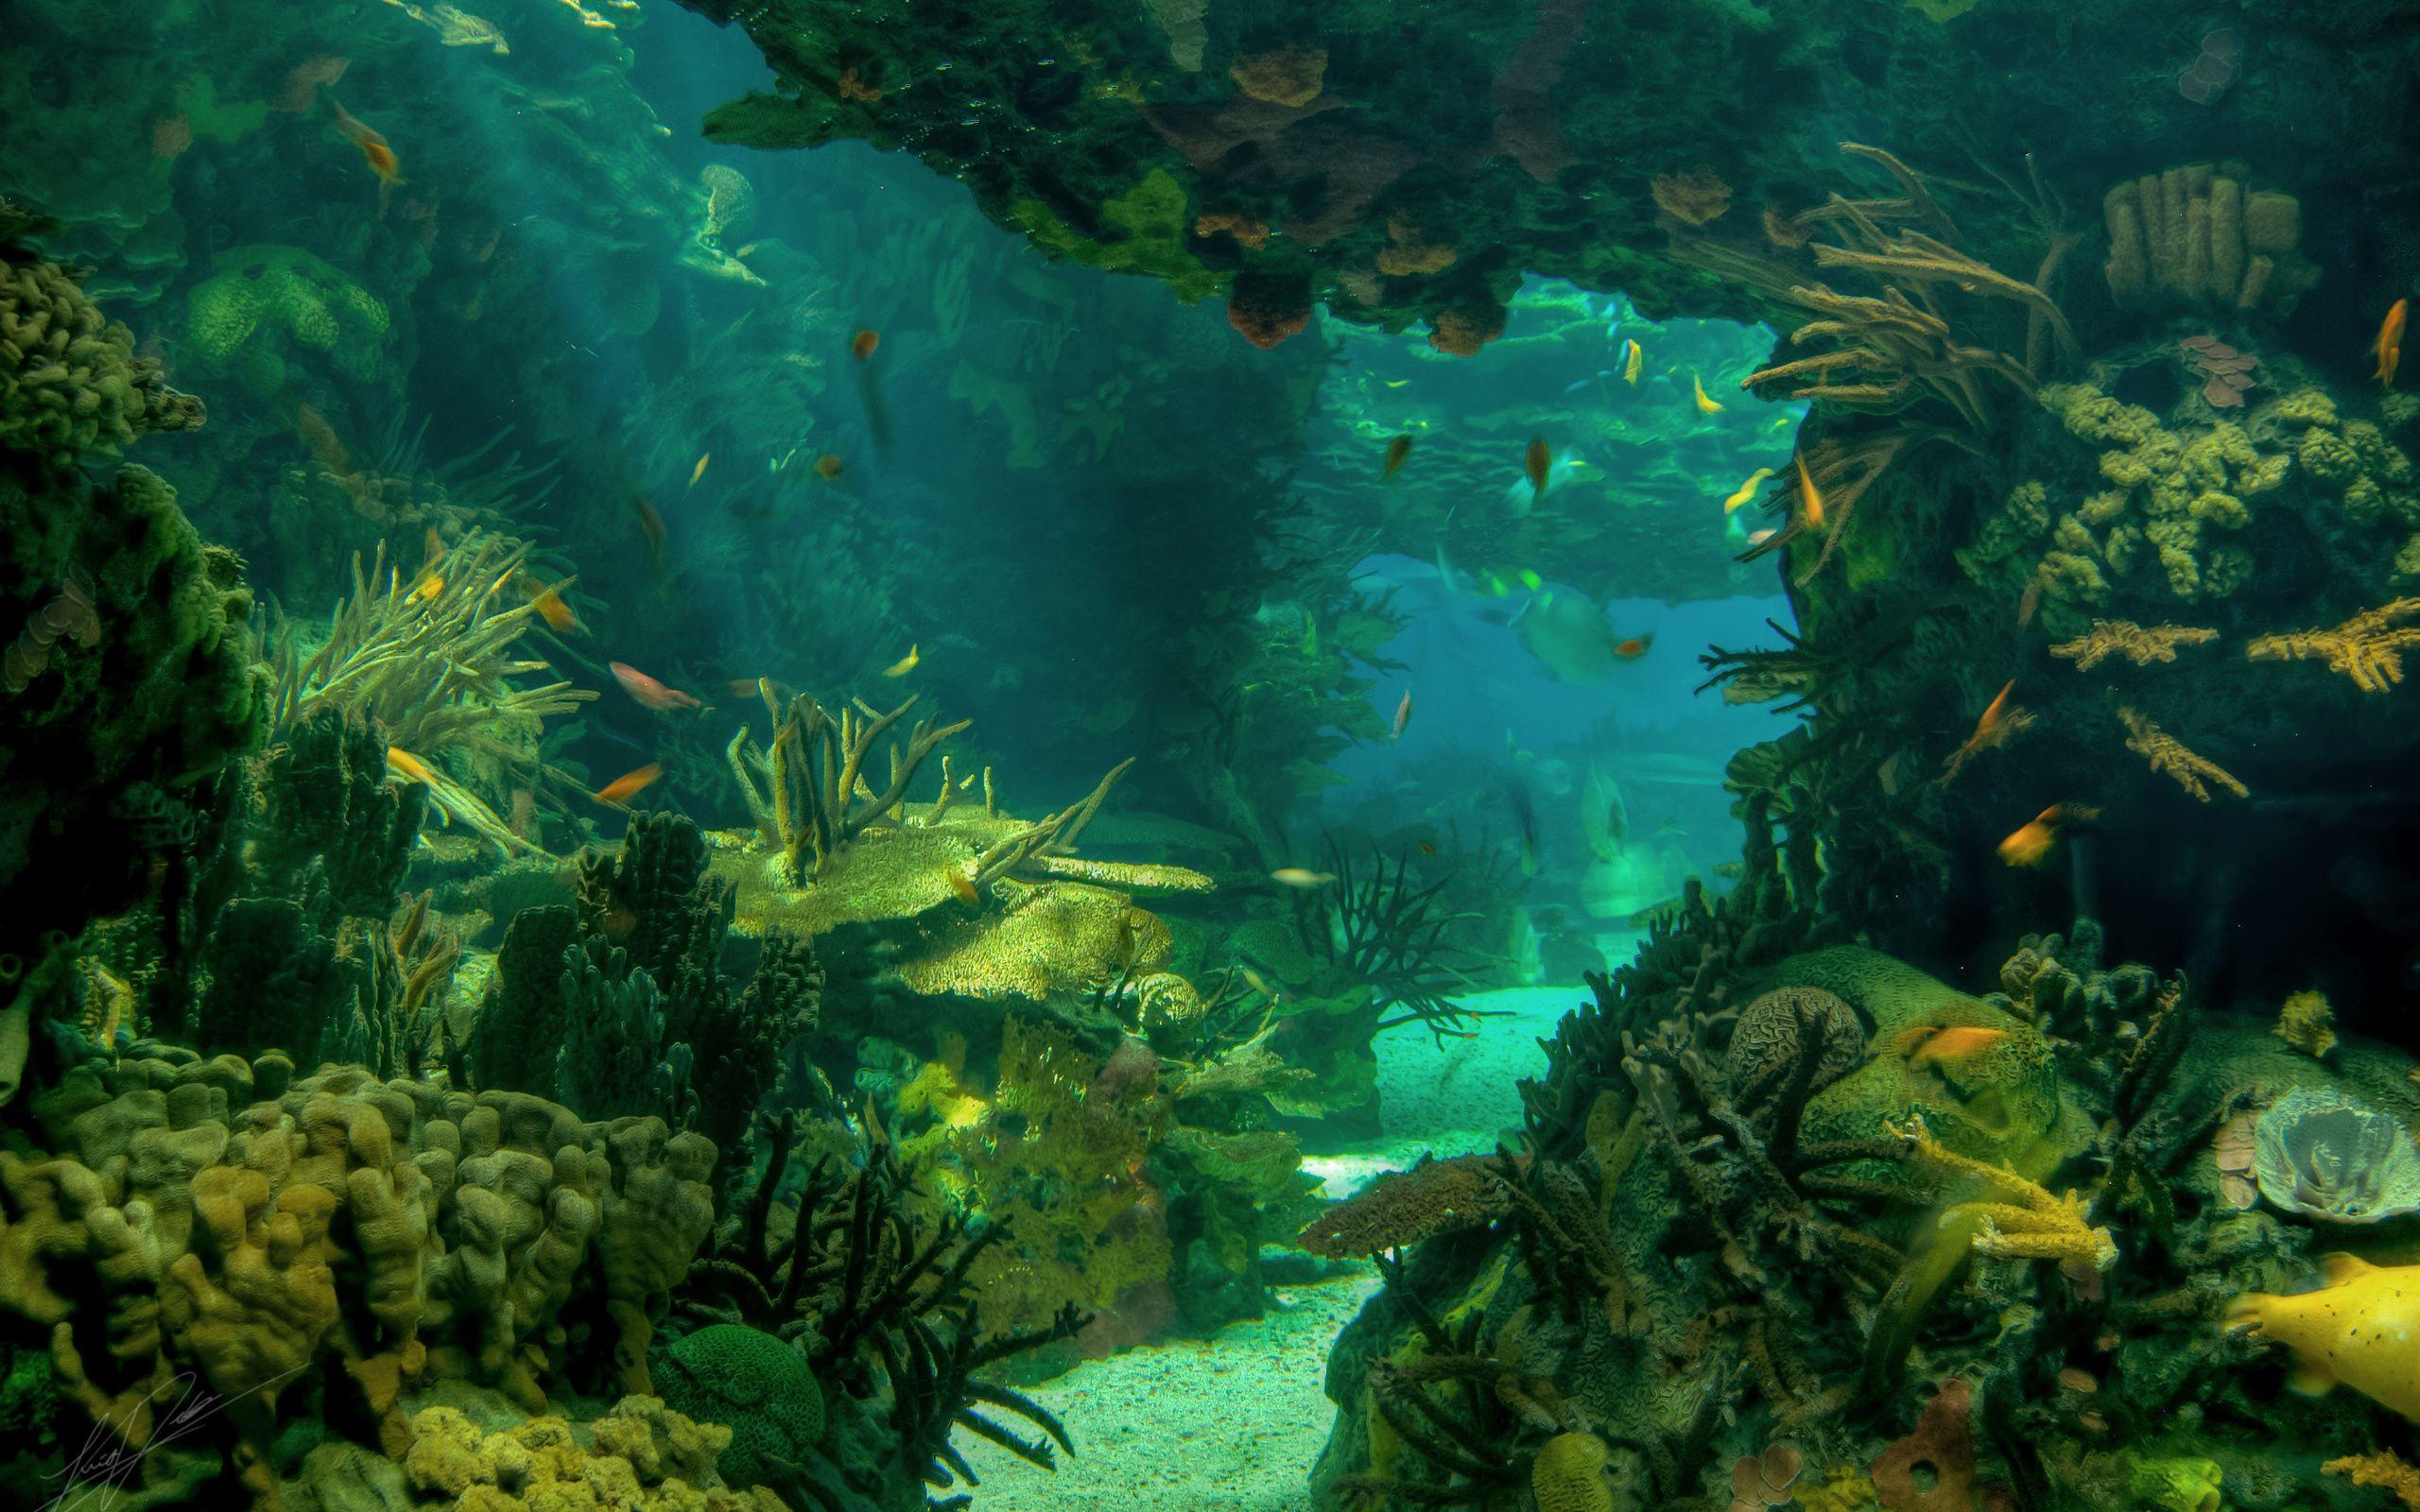 Sea Seabed Landscape Underwater Ocean Fish Wallpaper 2560x1600 89266 Wallpaperup Underwater Wallpaper Sea Pictures Ocean Wallpaper